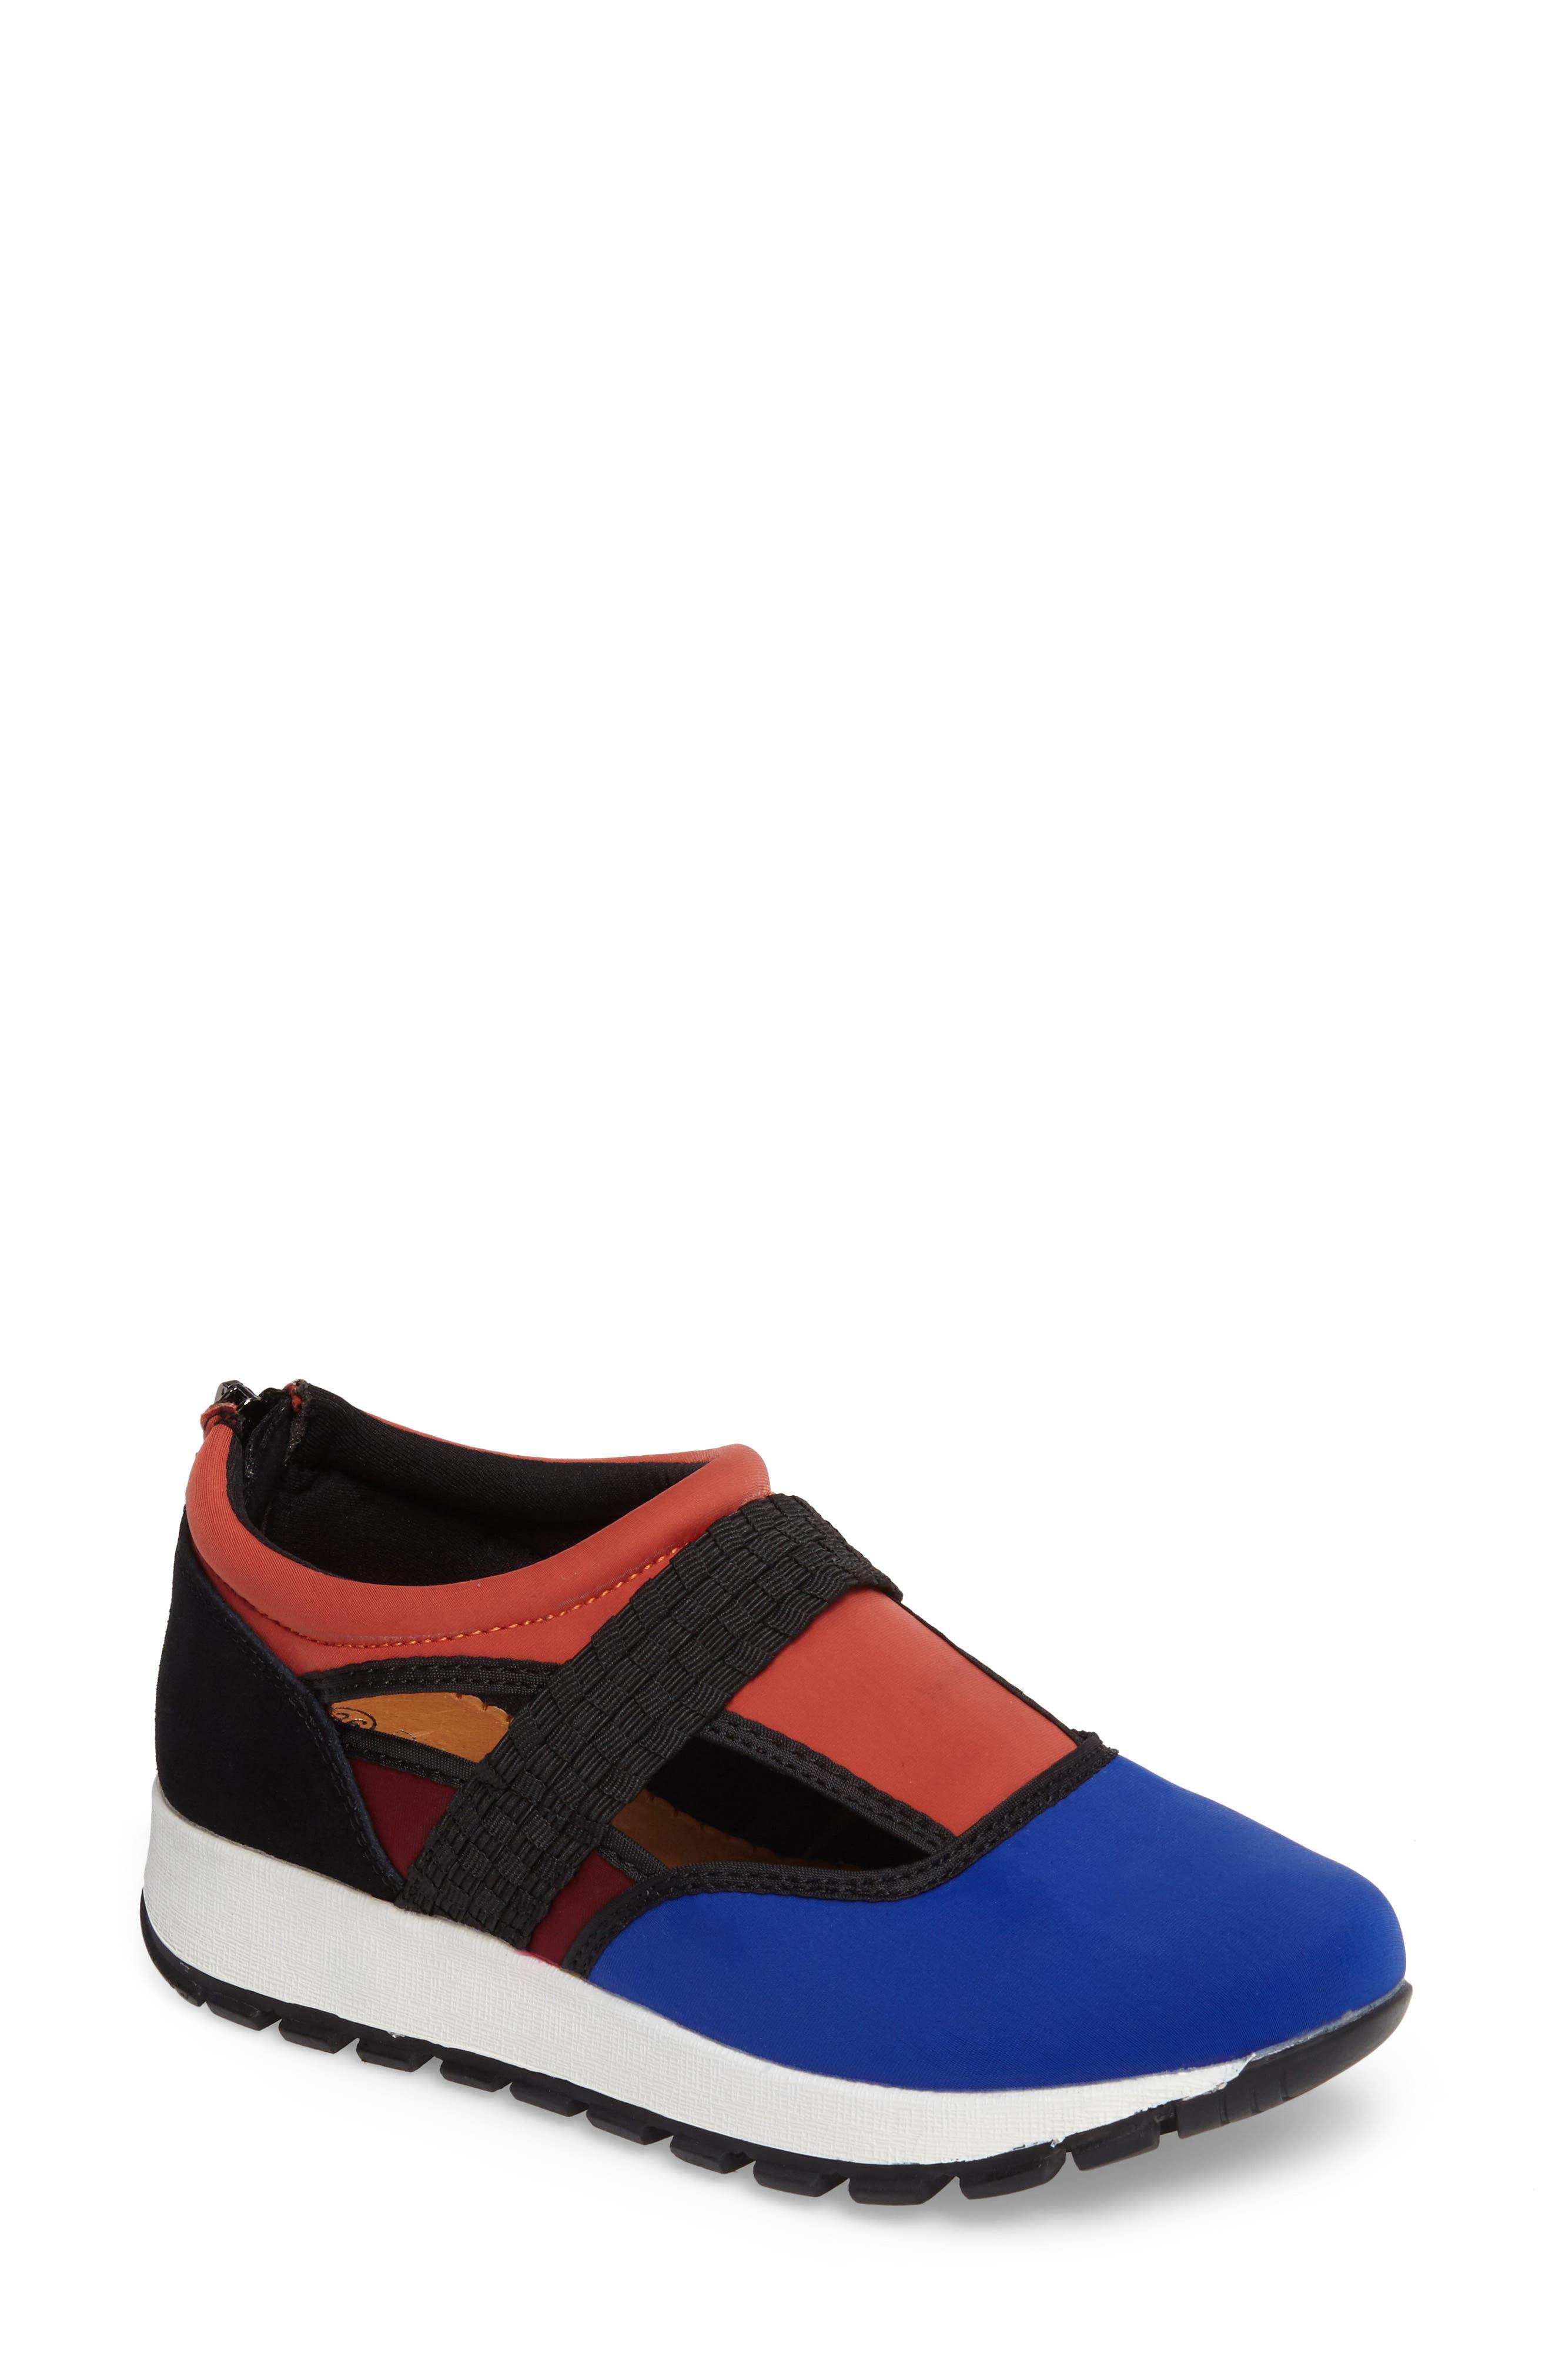 Bernie Mev Janelle Sneaker,                         Main,                         color, Royal Blue/ Coral Fabric